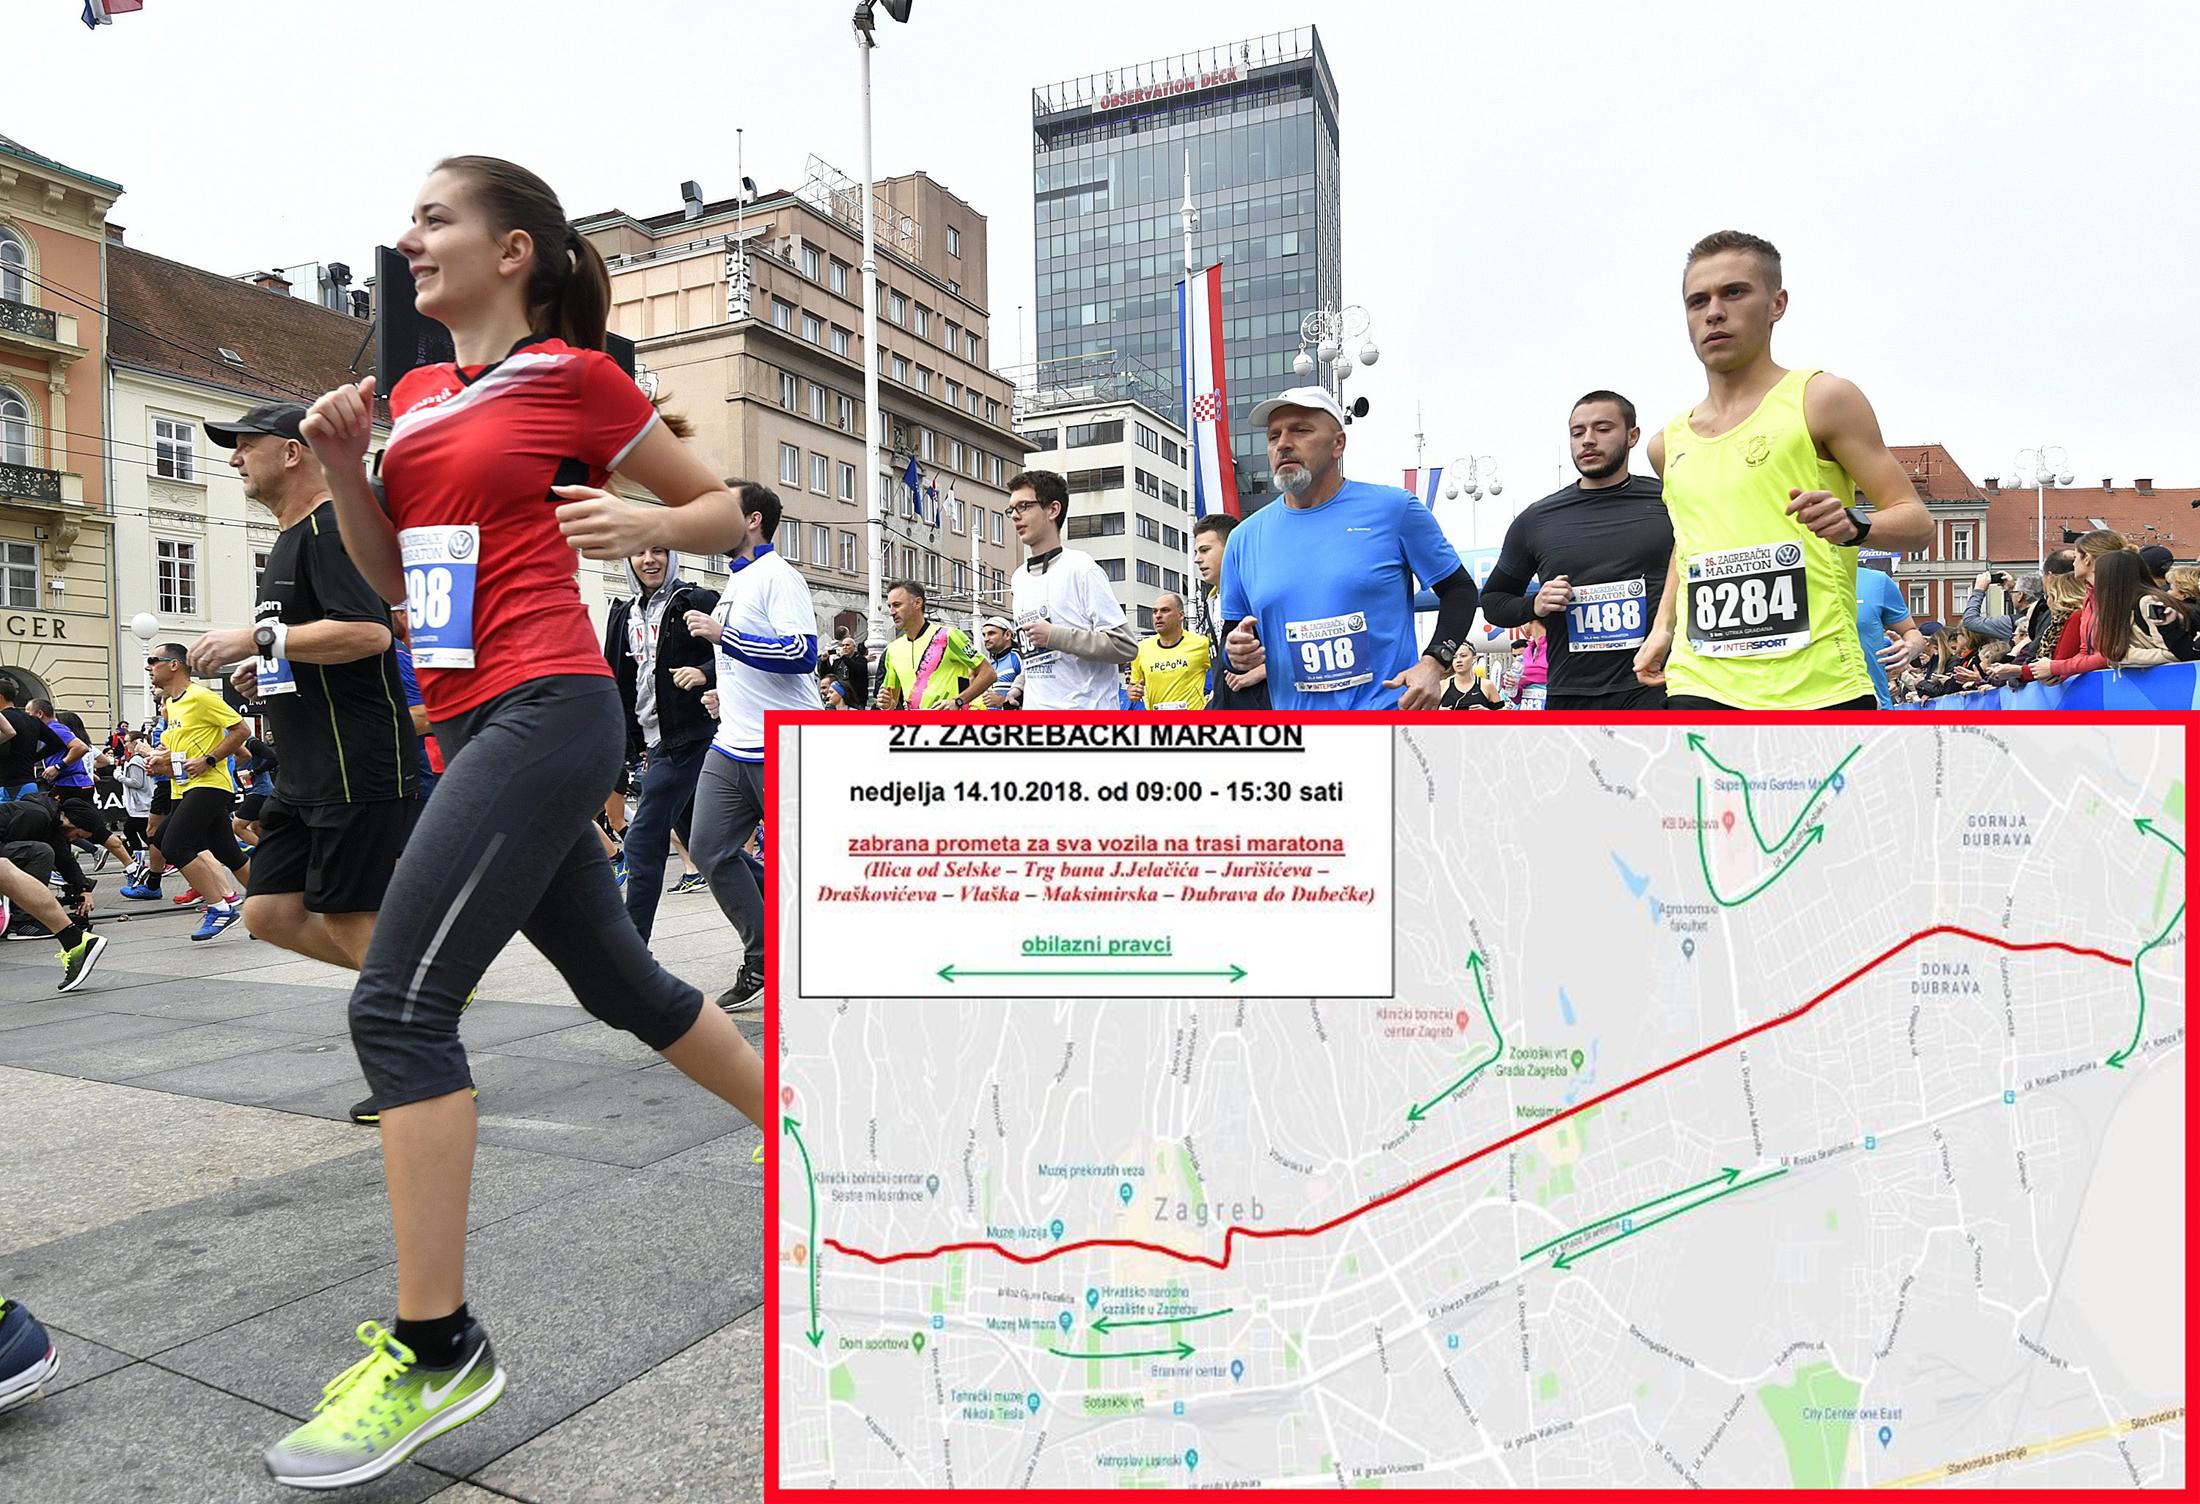 maraton-zagreb